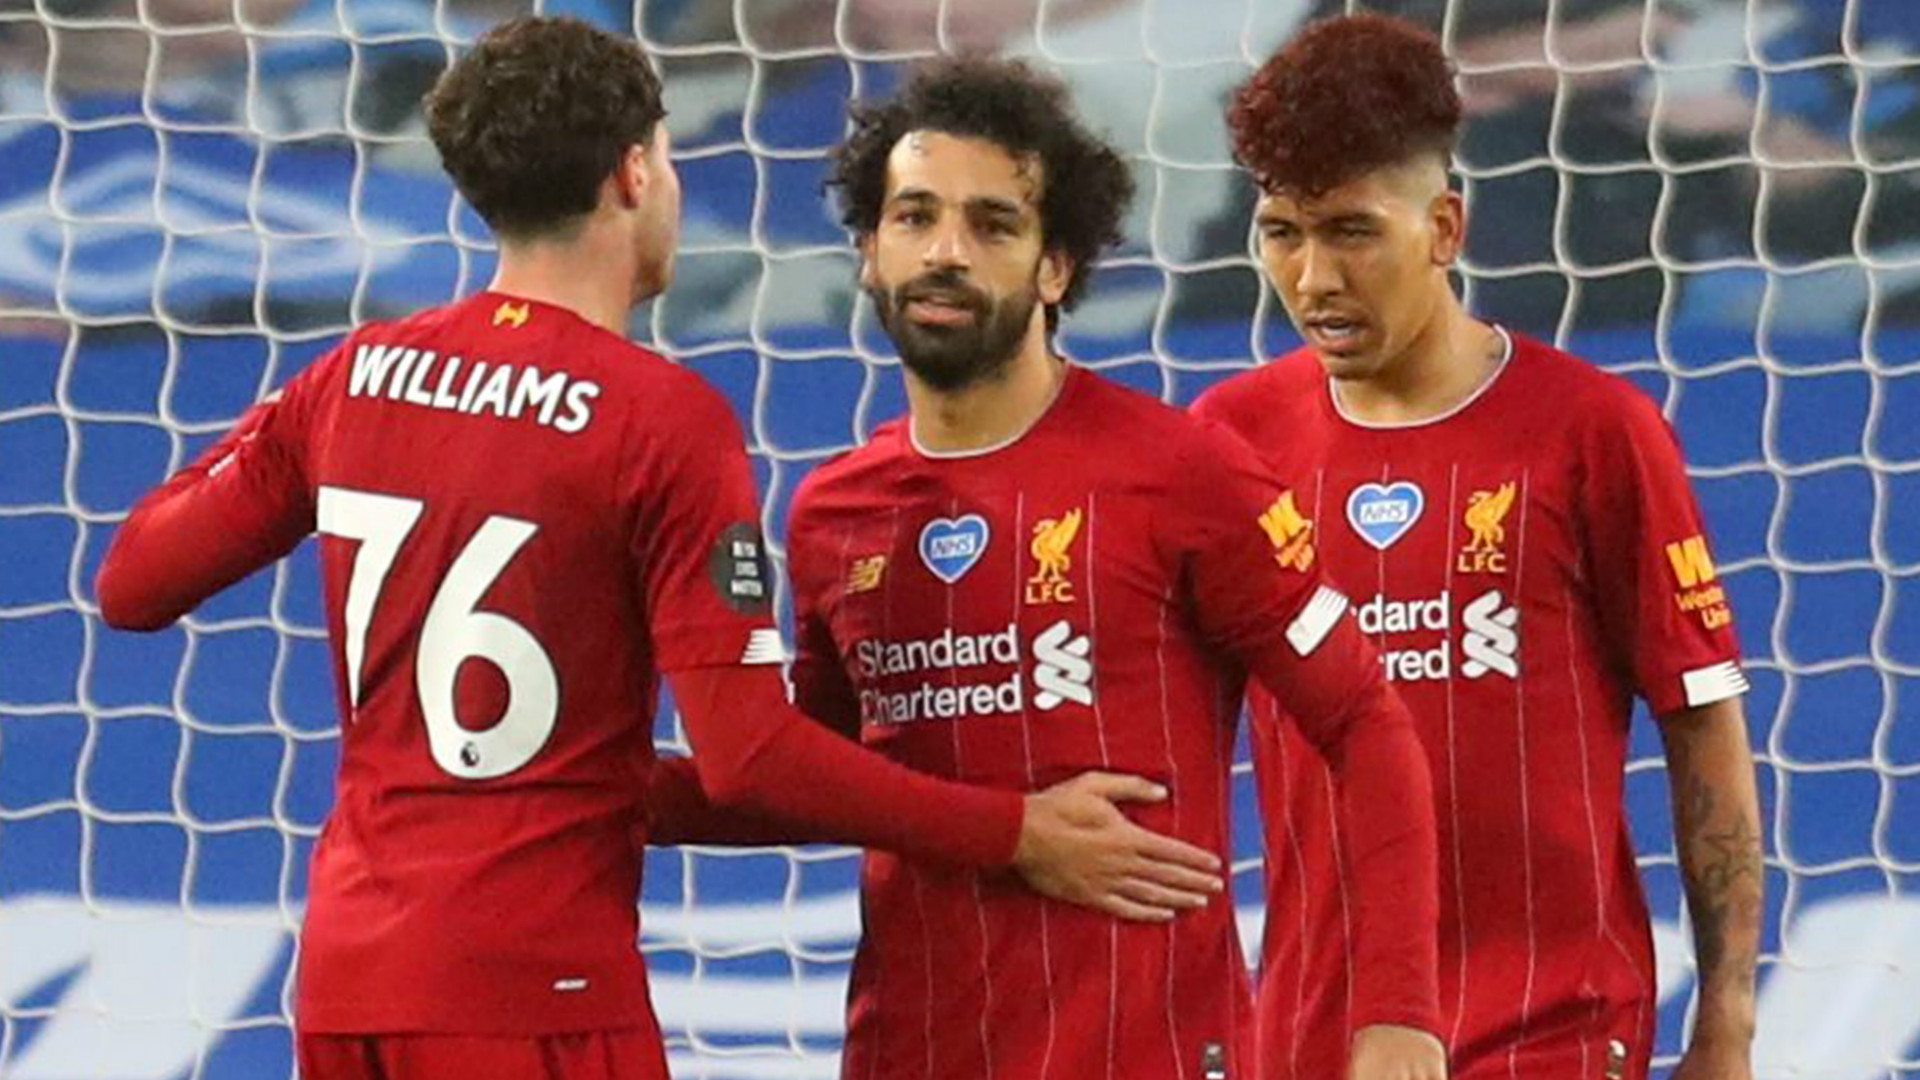 Agbonlahor: Salah thinks he is bigger than Liverpool team